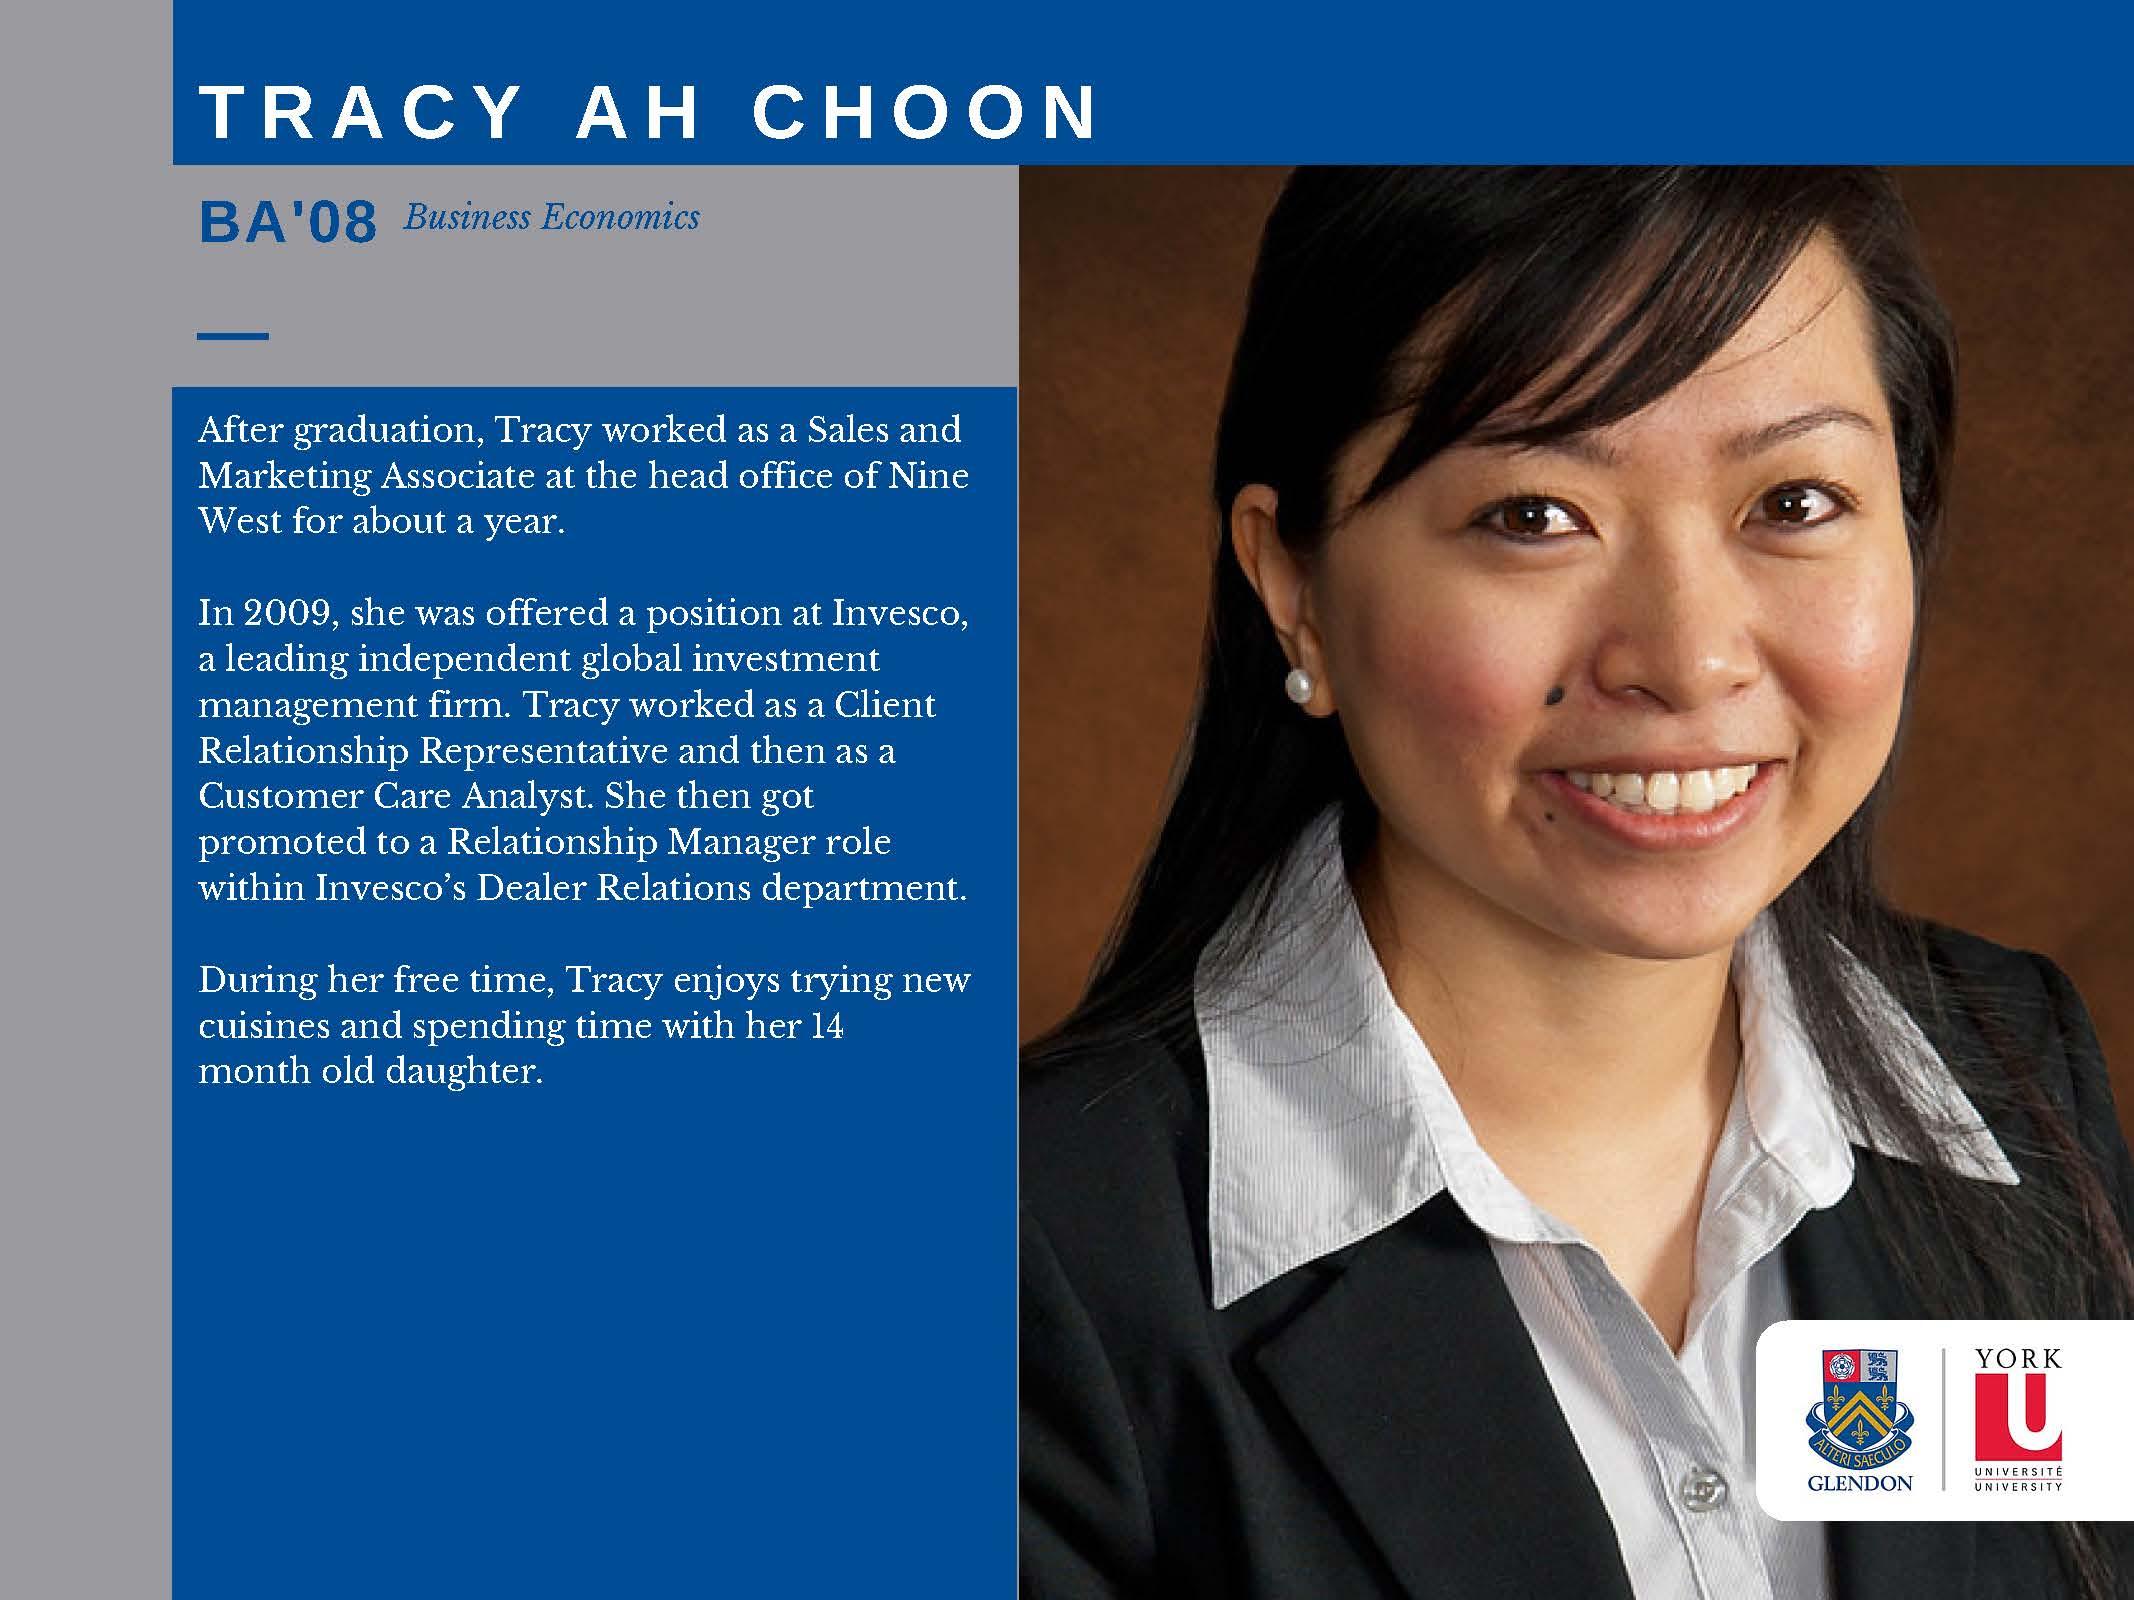 Tracy Ah Choon